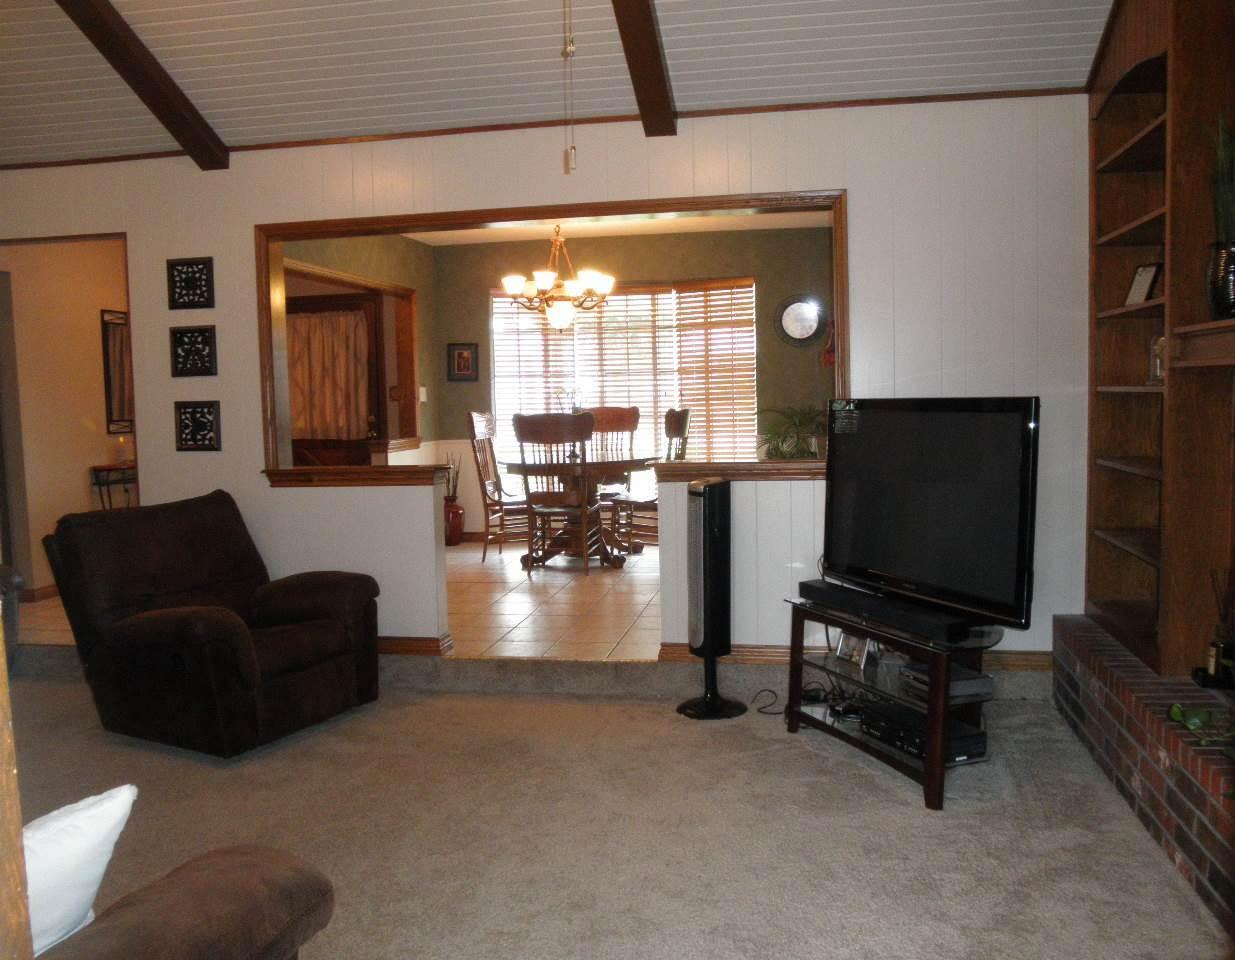 Sold Cross Sale W/ MLS | 2805 Ames  Ponca City, OK  8